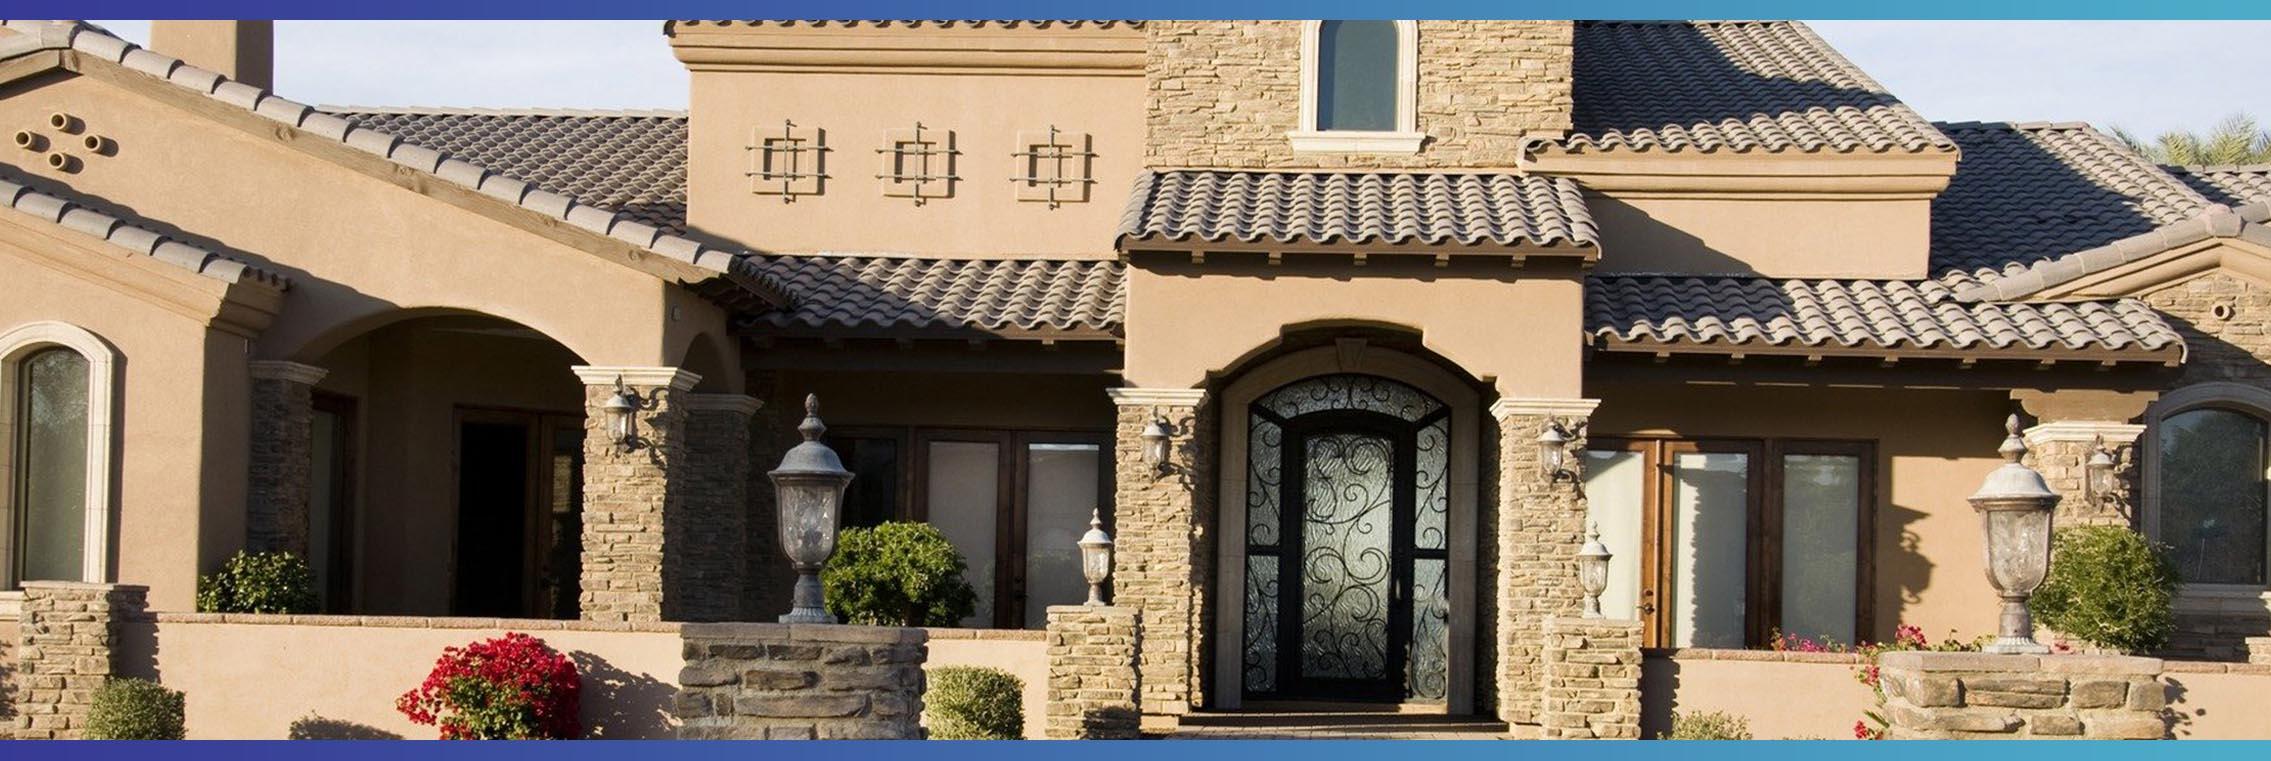 Header image - Pella and Andersen wood windows